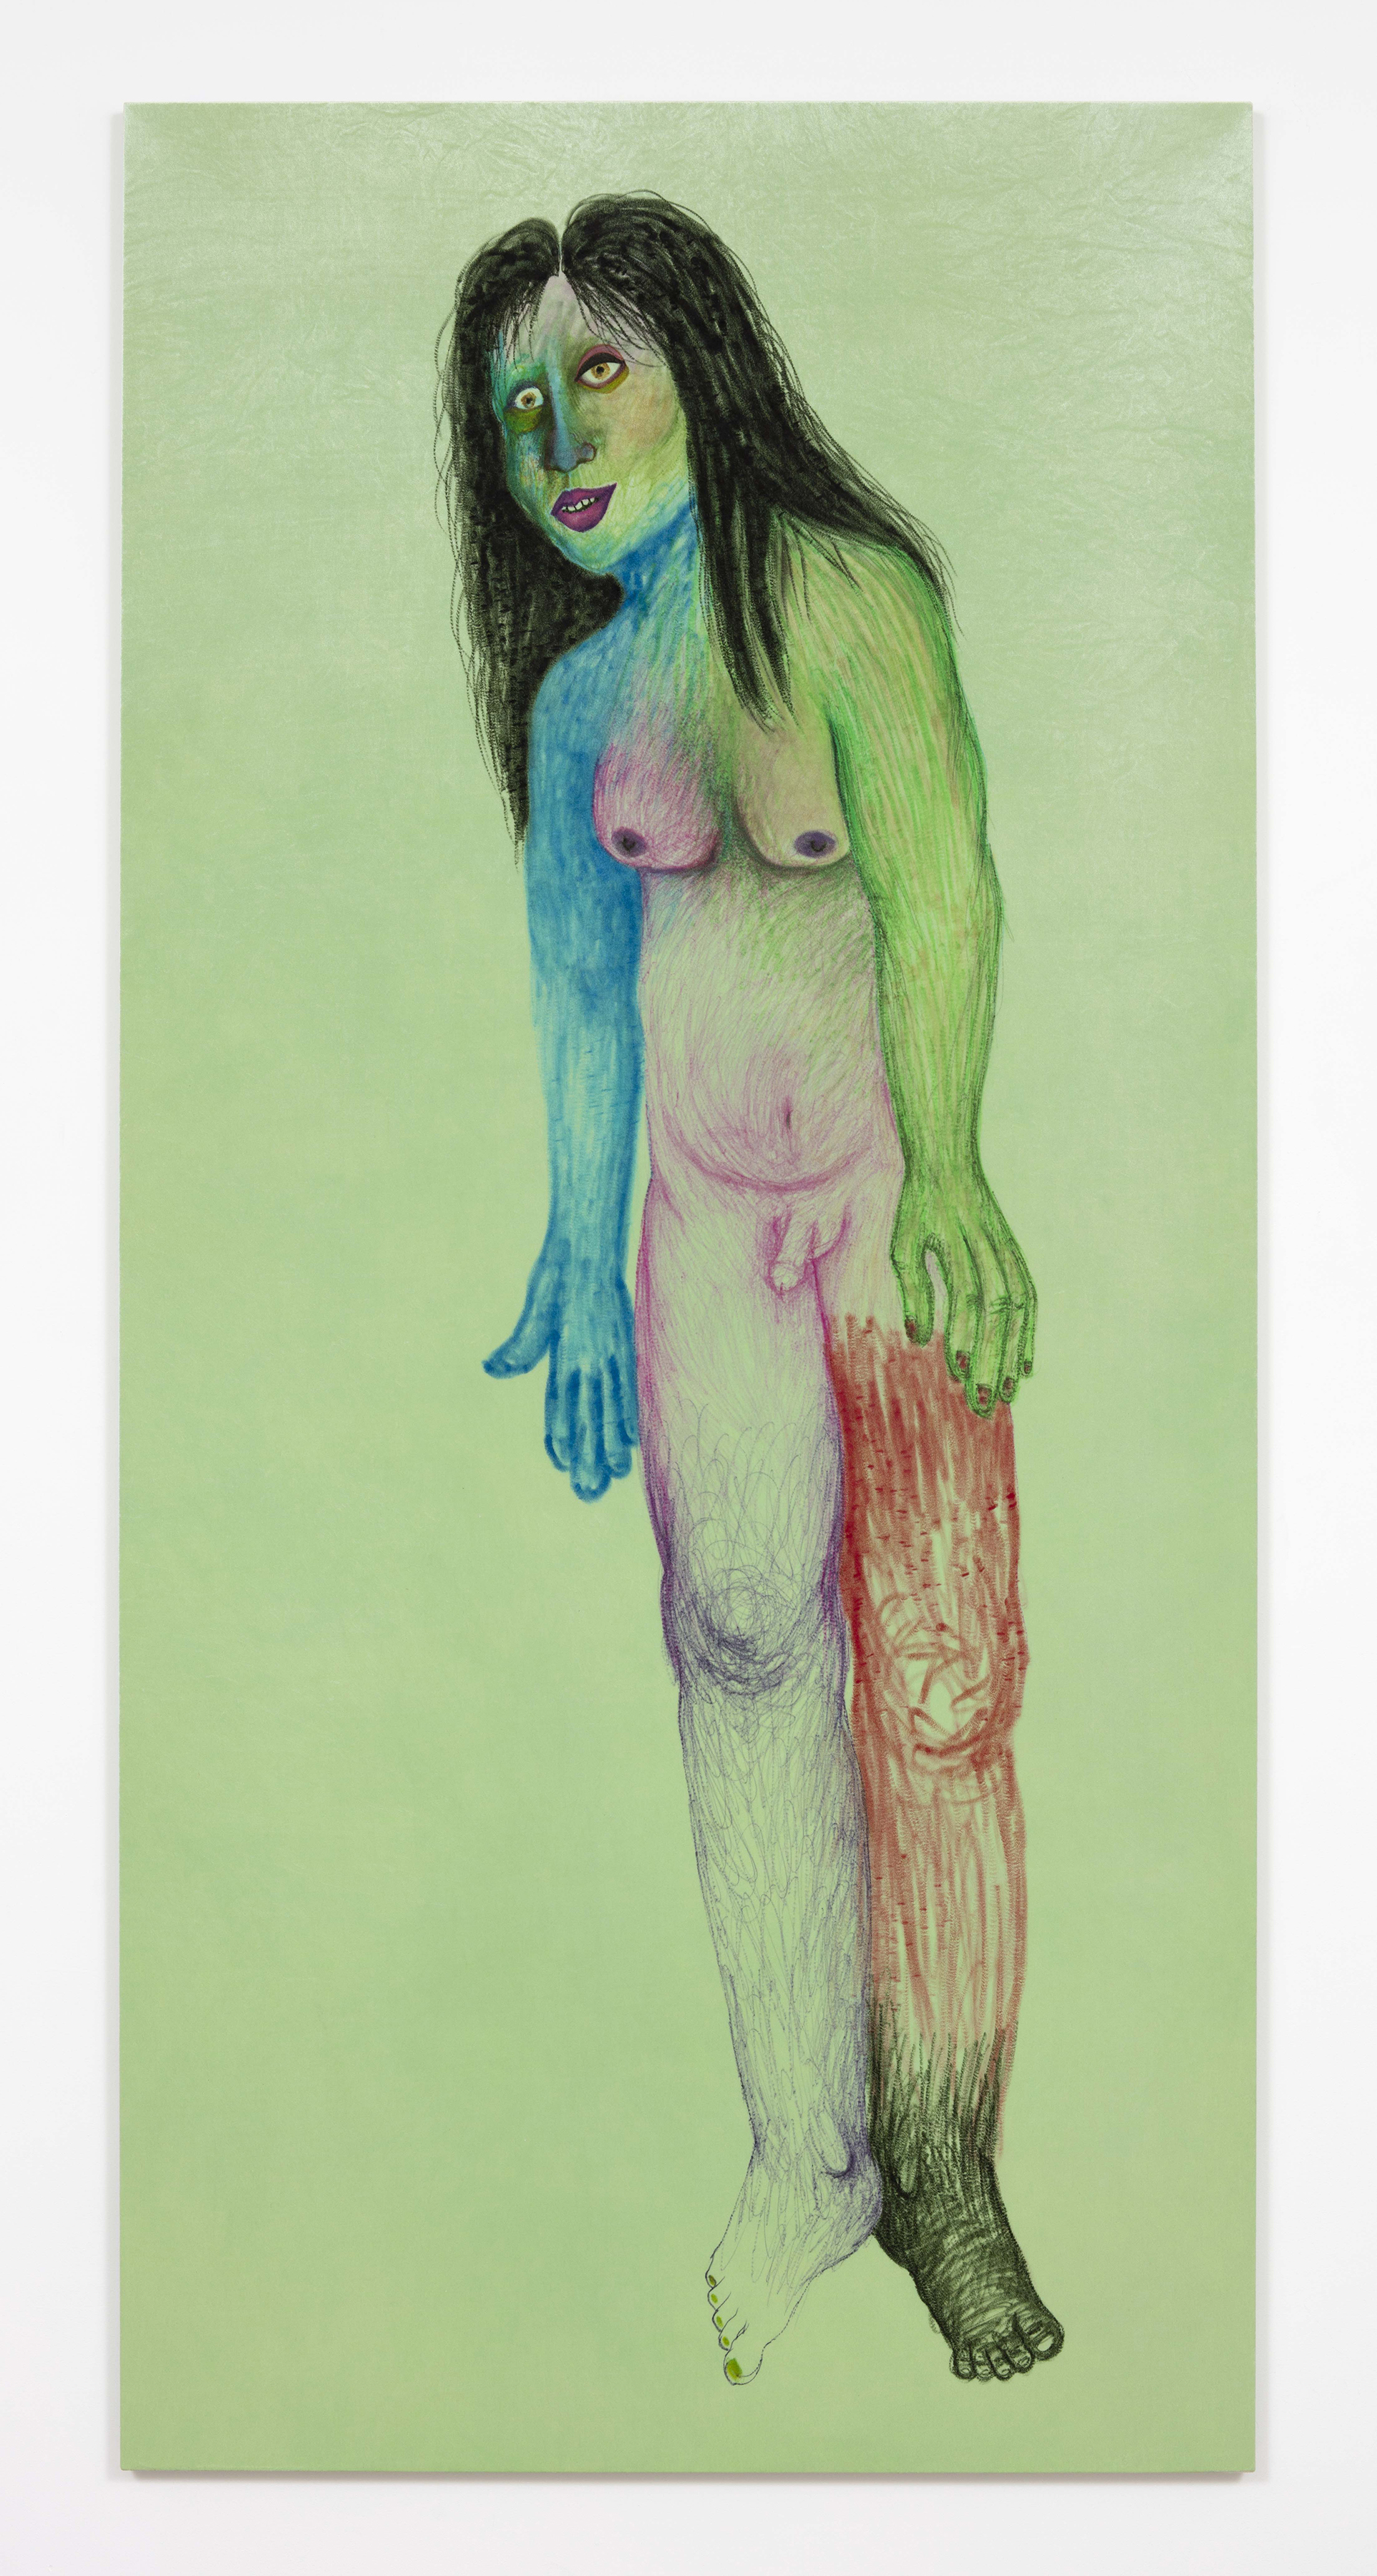 <em>Sarai</em>, 2017. Fabric marker on panne velvet, 109 x 52 1/4 inches